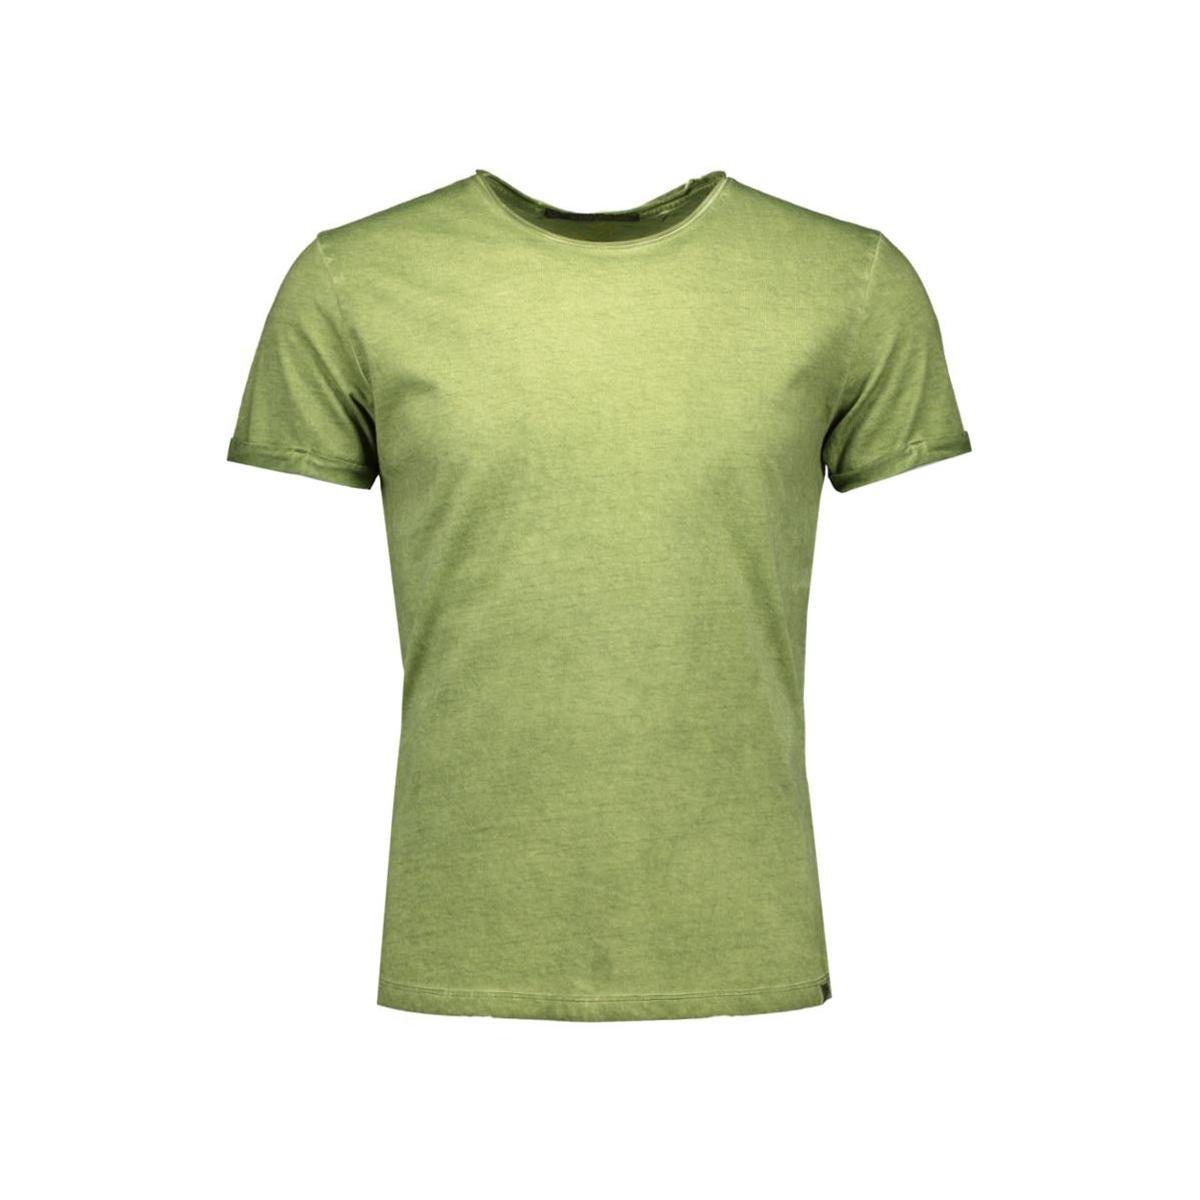 78320715 no-excess t-shirt 195 basil